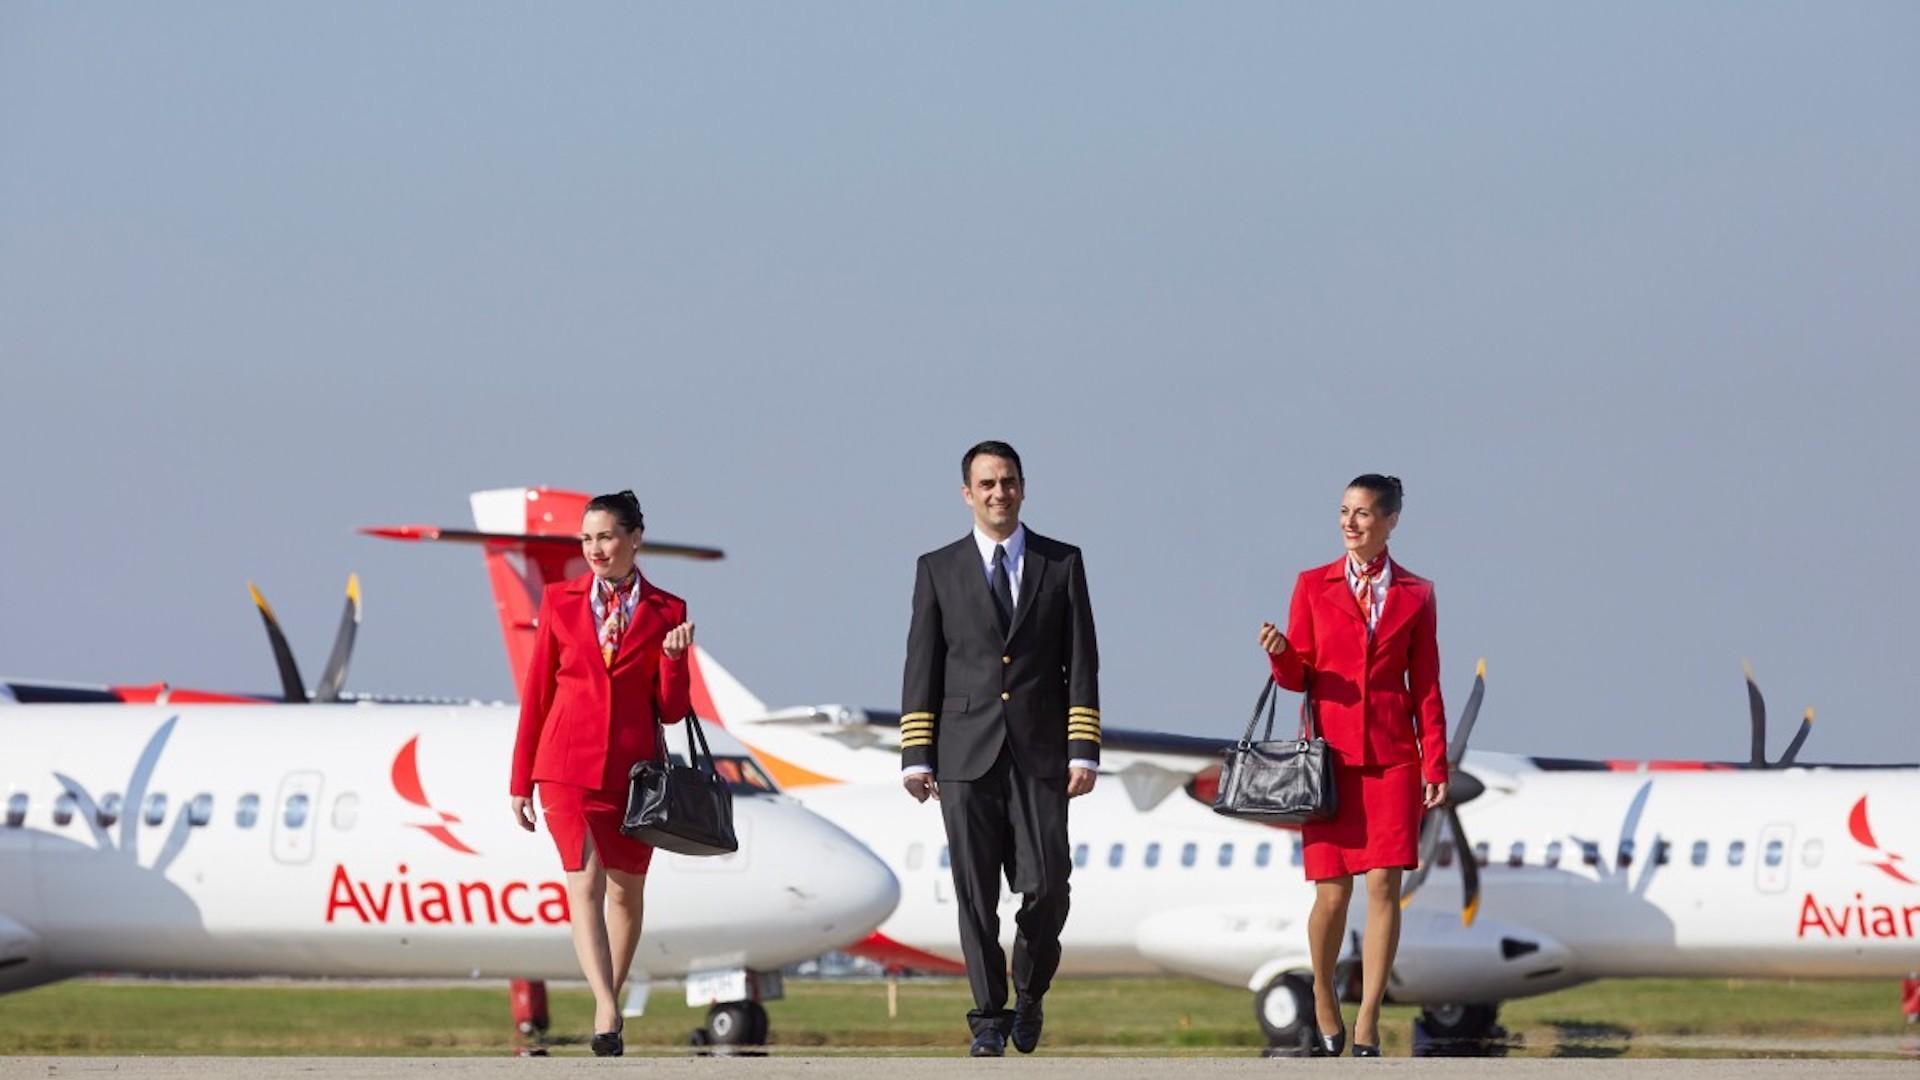 Avianca comenzó a vender pasajes para sus vuelos dentro de Argentina